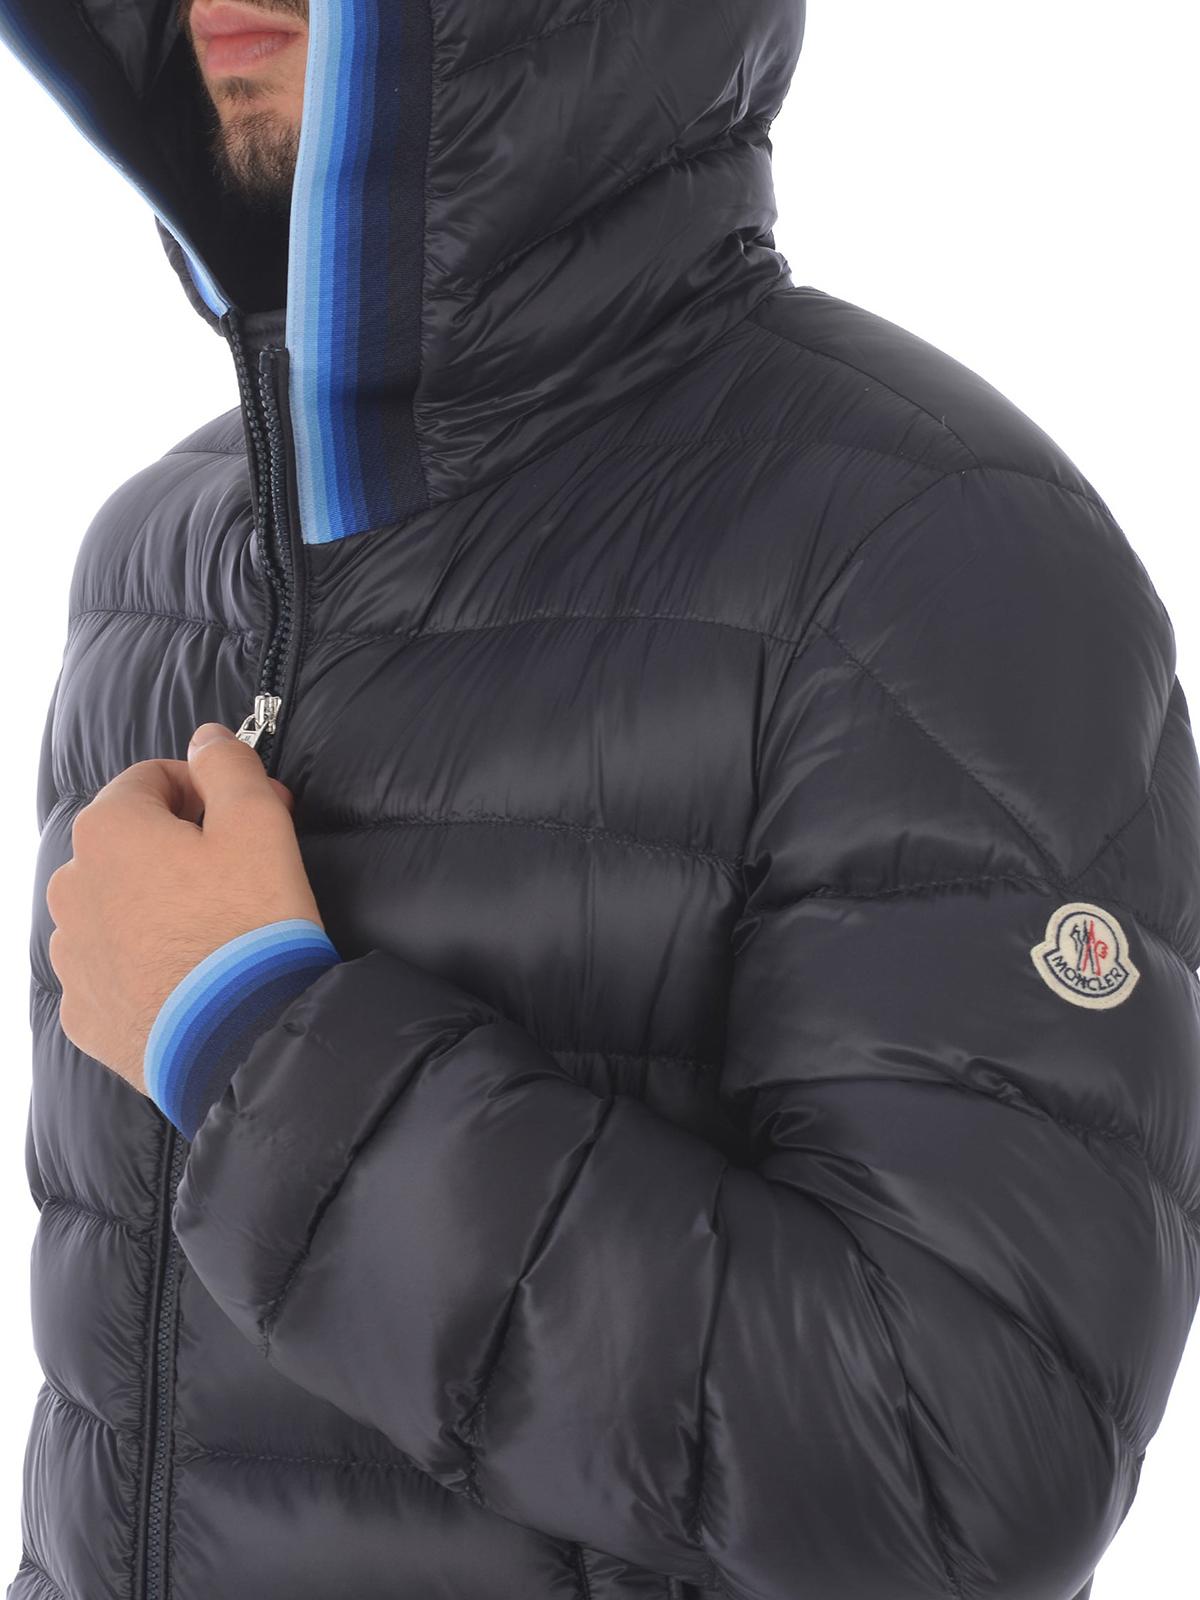 b2425745e Moncler - Avrieux nylon doudoune légère puffer jacket - padded ...